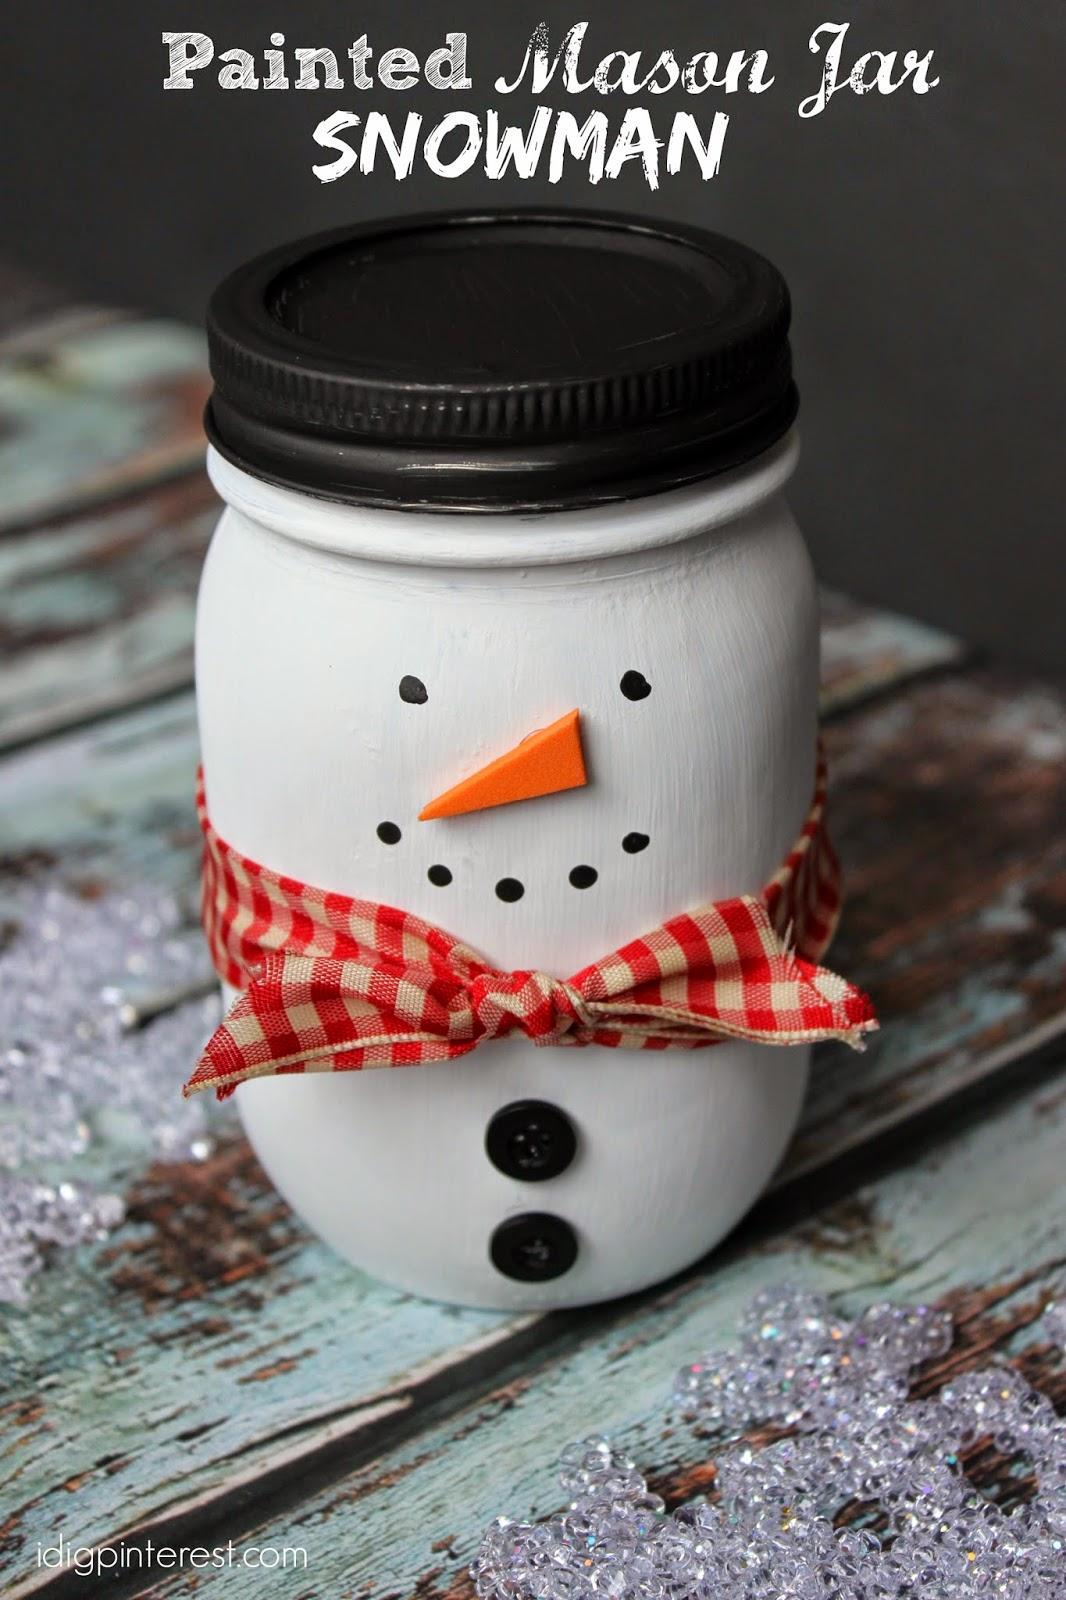 Painted Mason Jar Snowman Craft/Gift - I Dig Pinterest